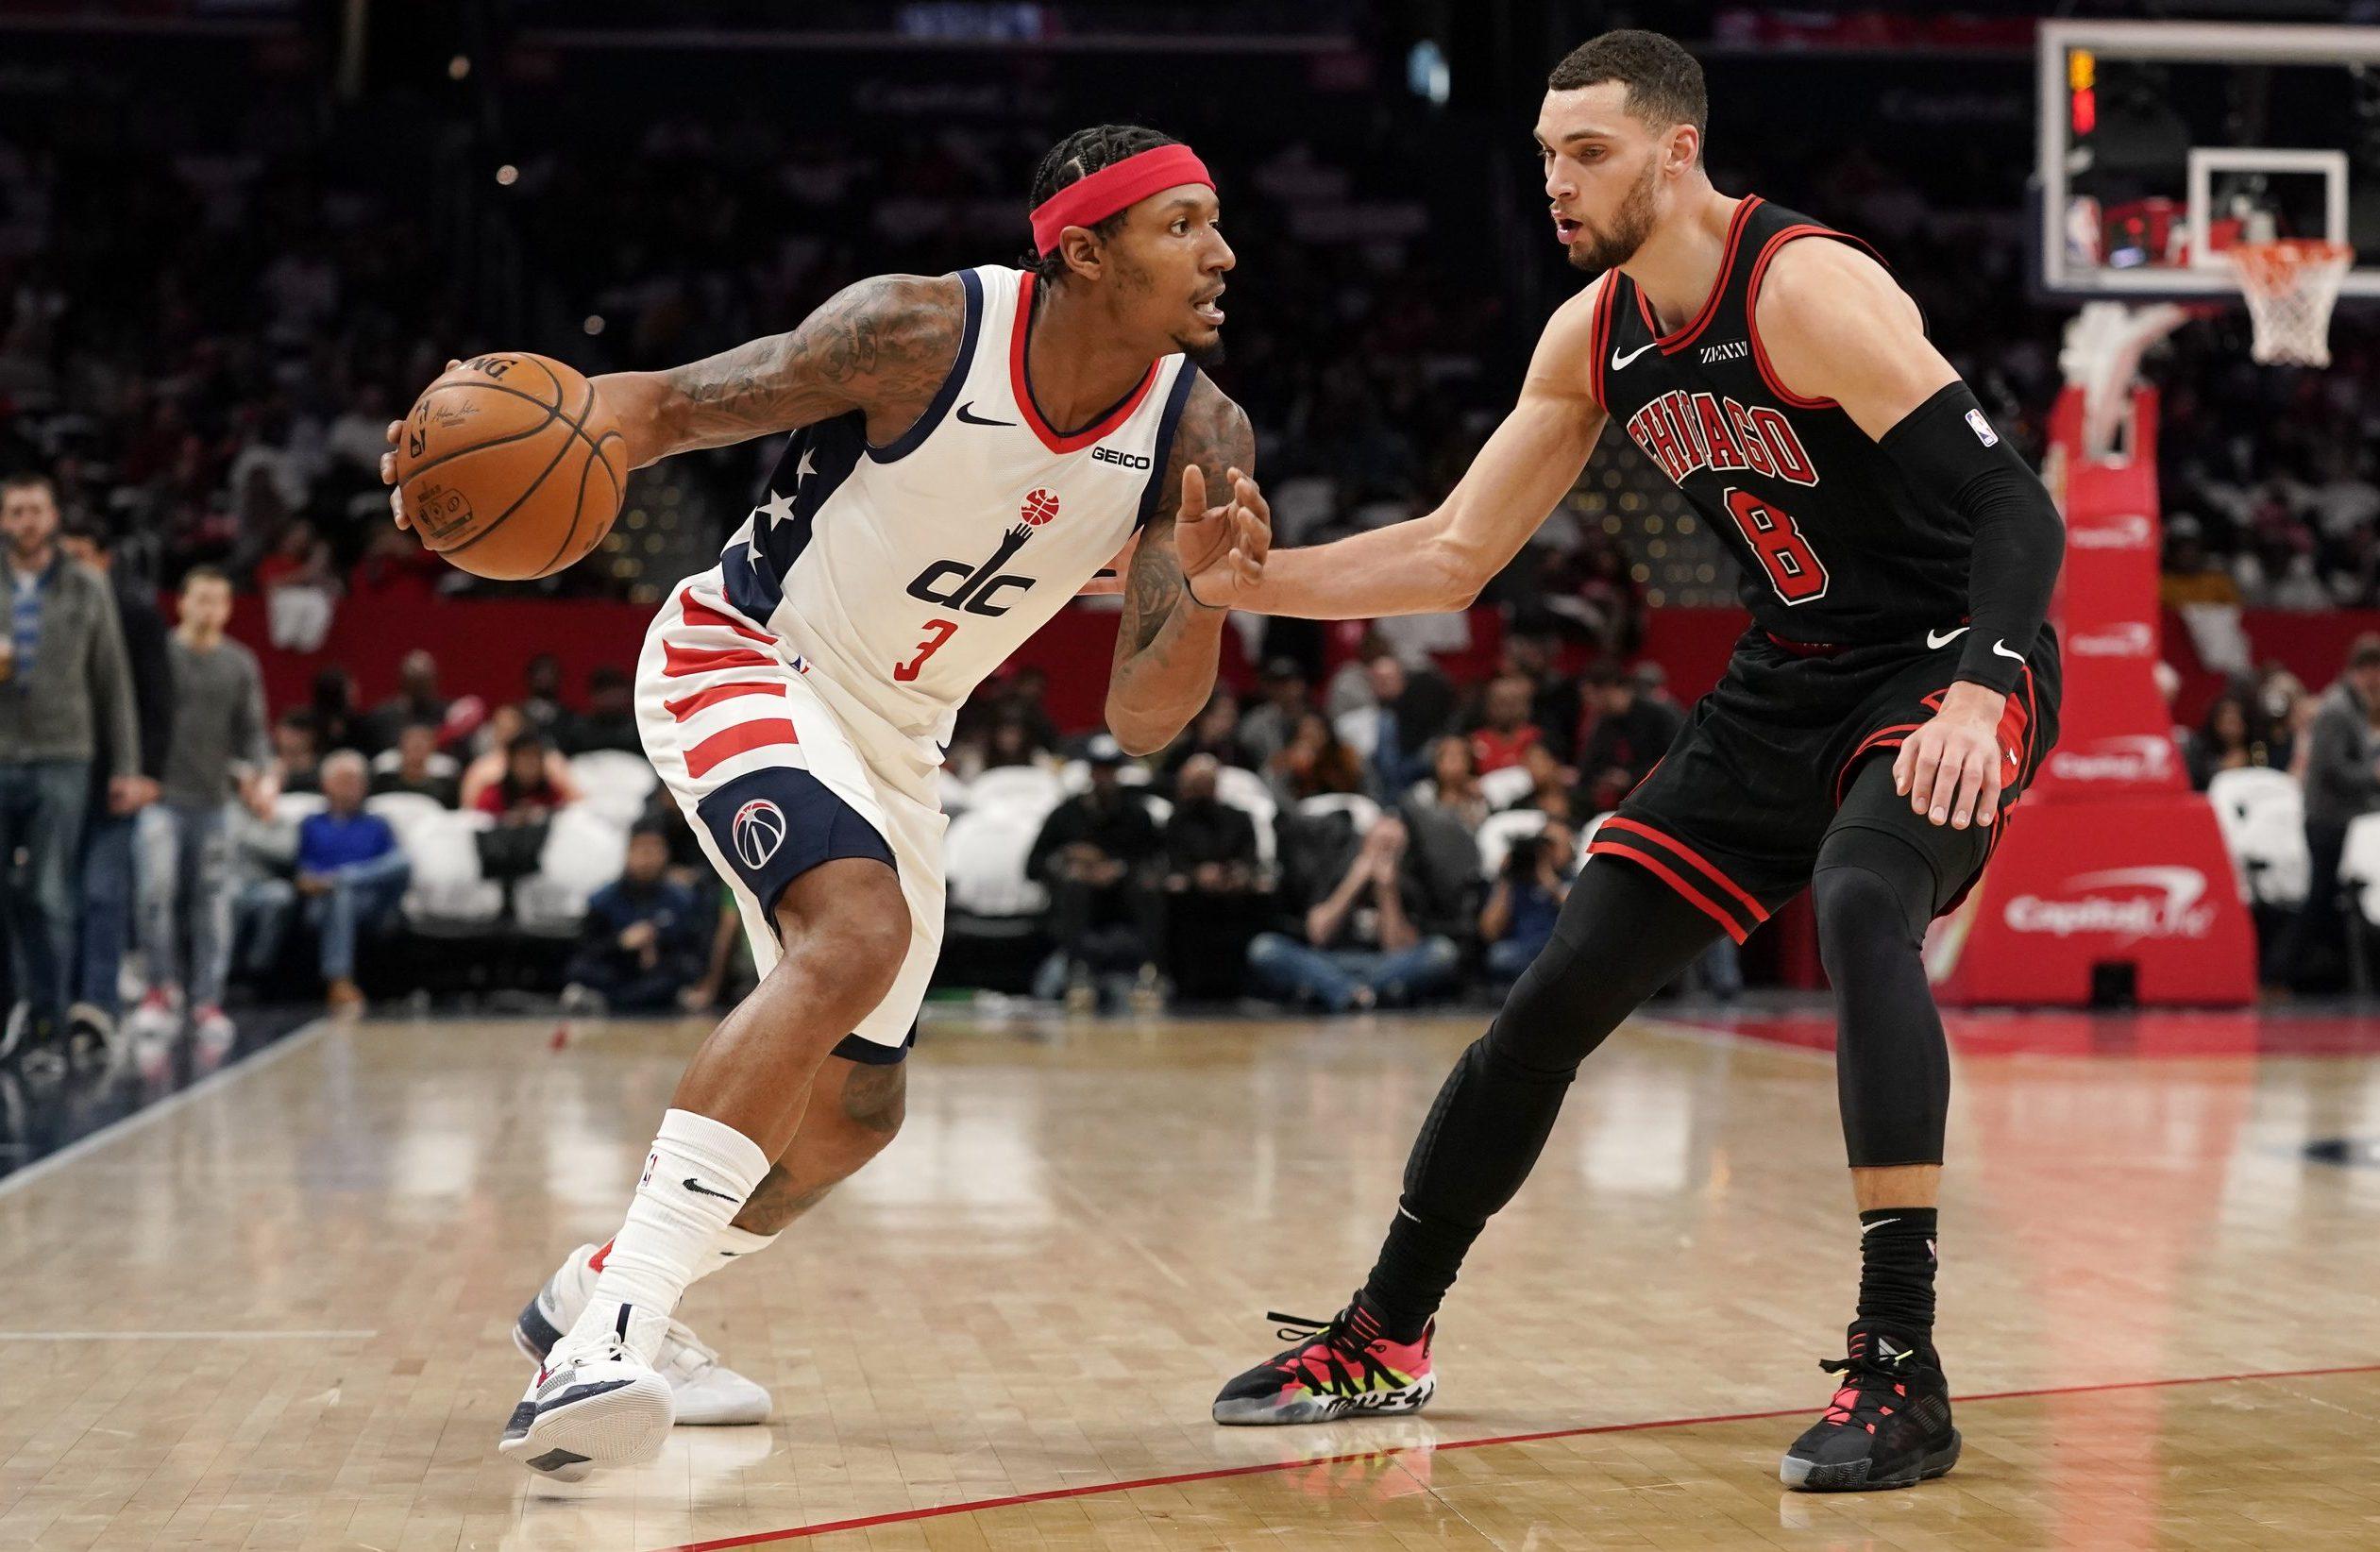 Derrick Rose w Knicks – wraca do trenera Thibodeau!